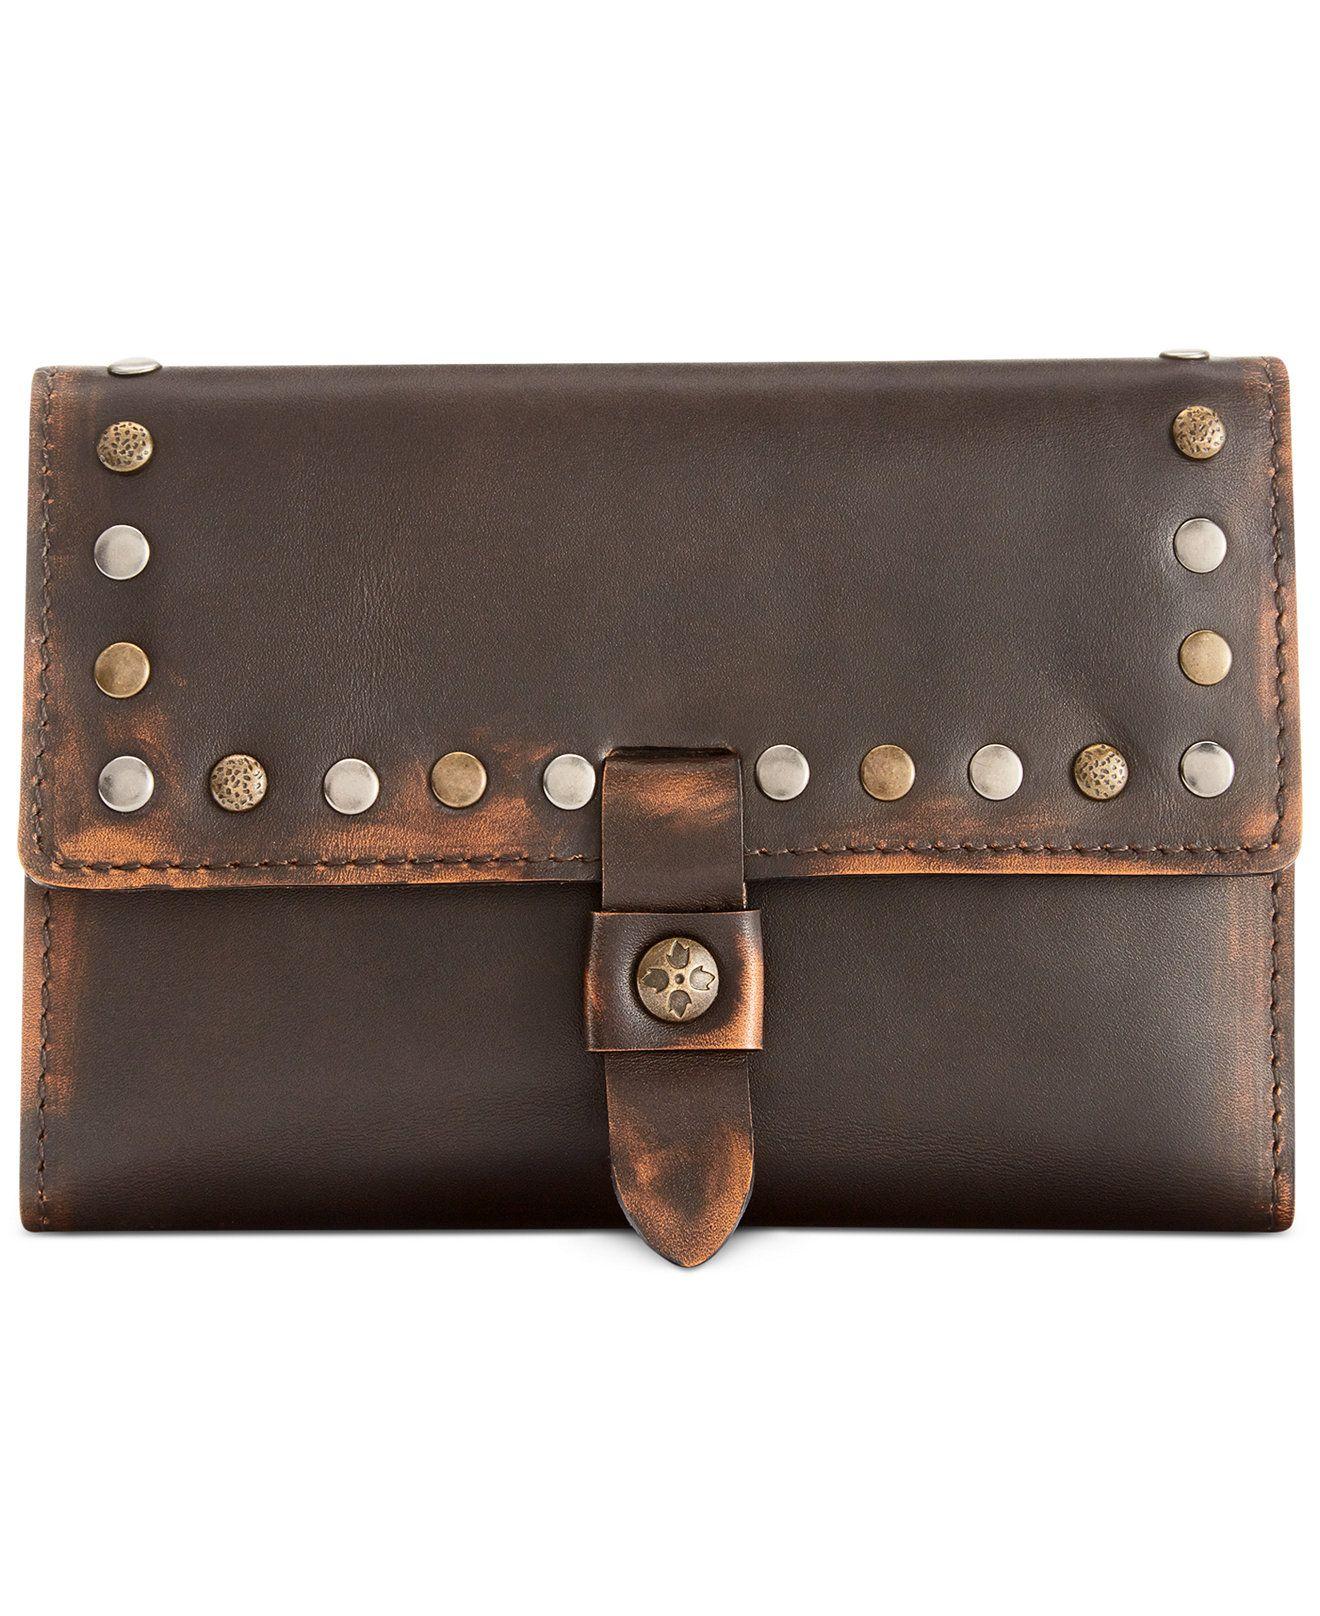 Patricia Nash Overdyed Colli Wallet Handbags Accessories Macy S